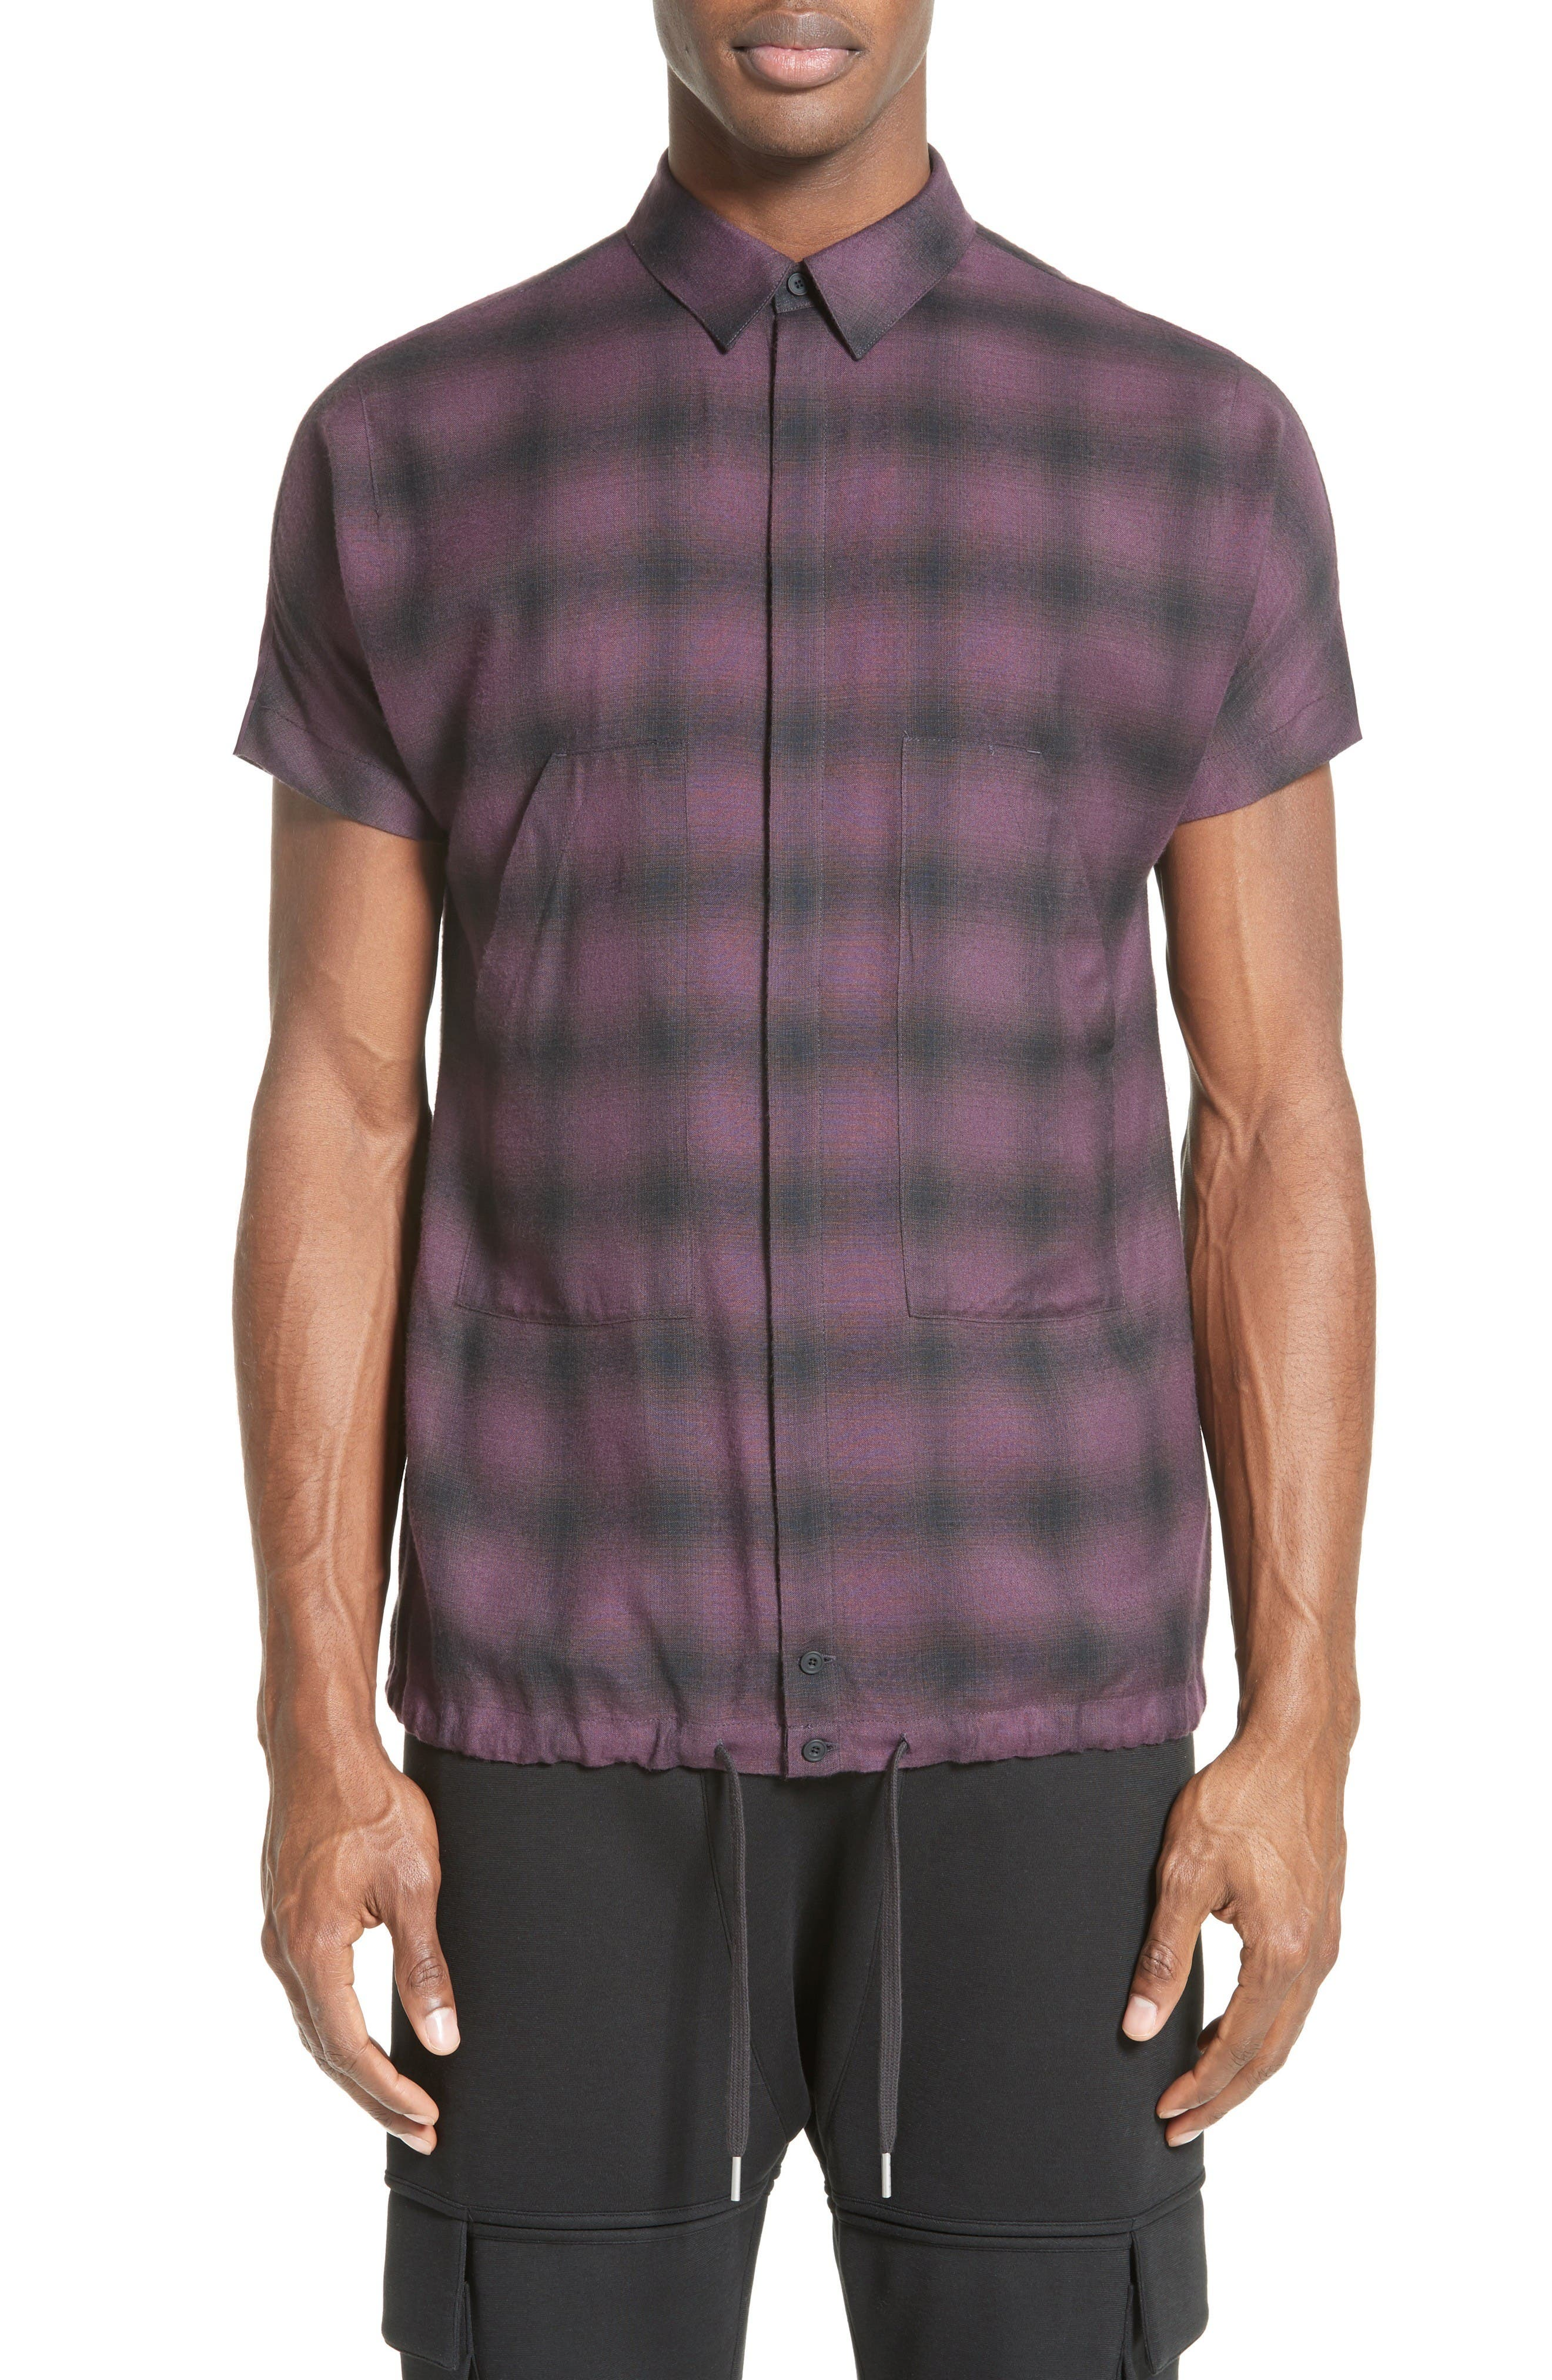 Alternate Image 1 Selected - Helmut Lang Ombré Check Short Sleeve Sport Shirt